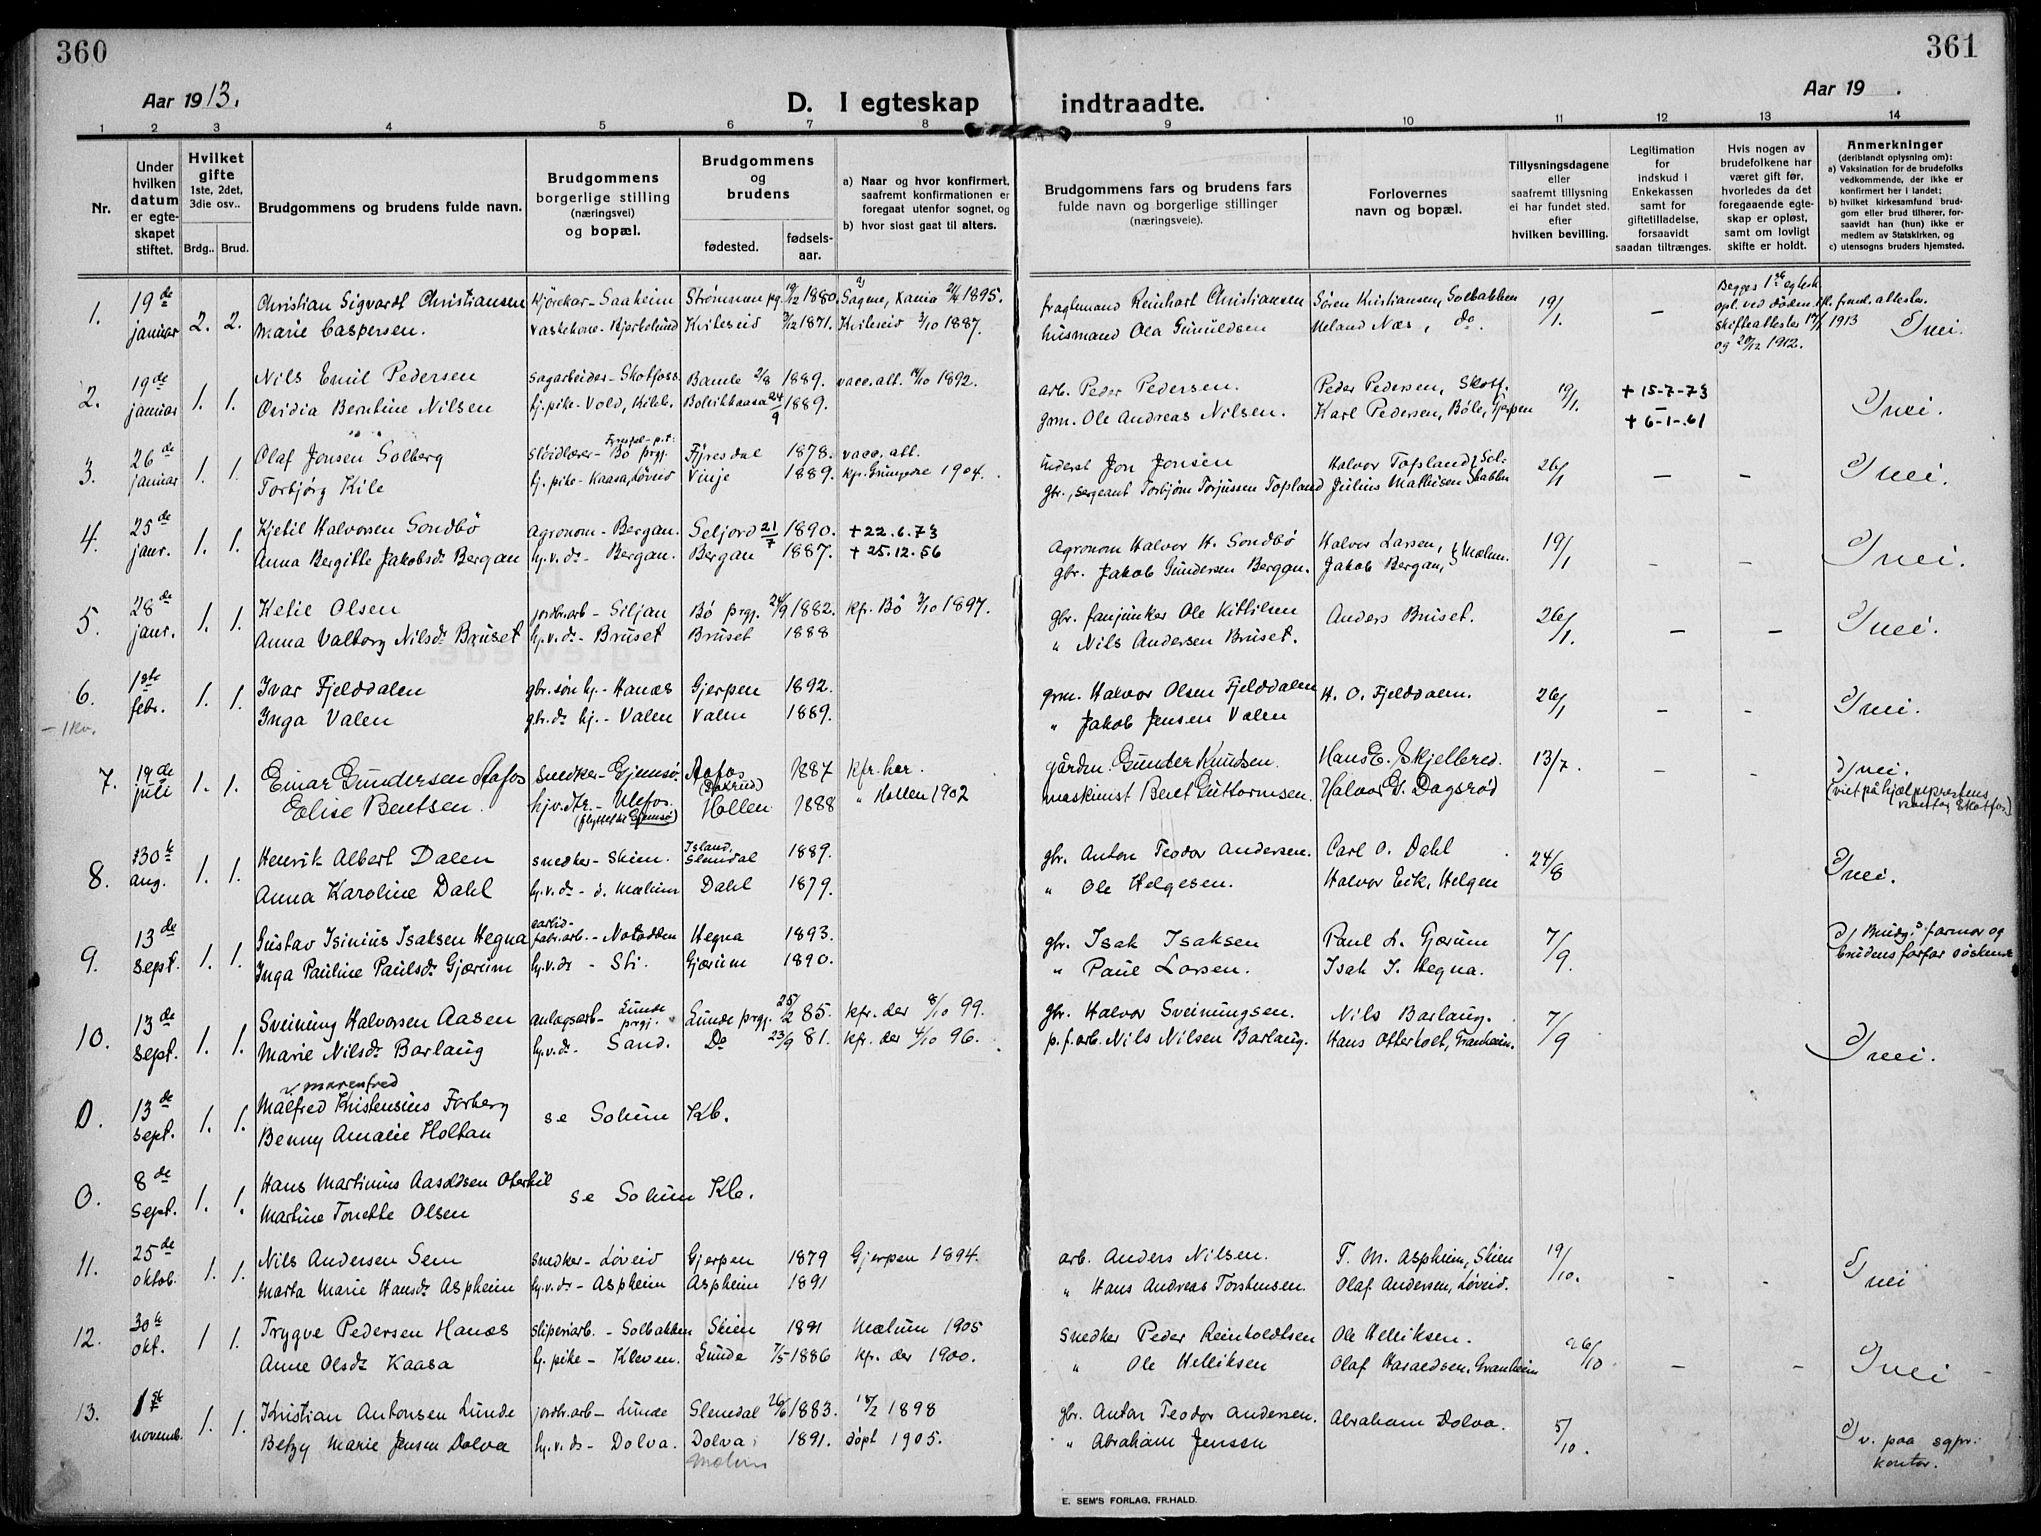 SAKO, Solum kirkebøker, F/Fb/L0004: Ministerialbok nr. II 4, 1913-1924, s. 360-361